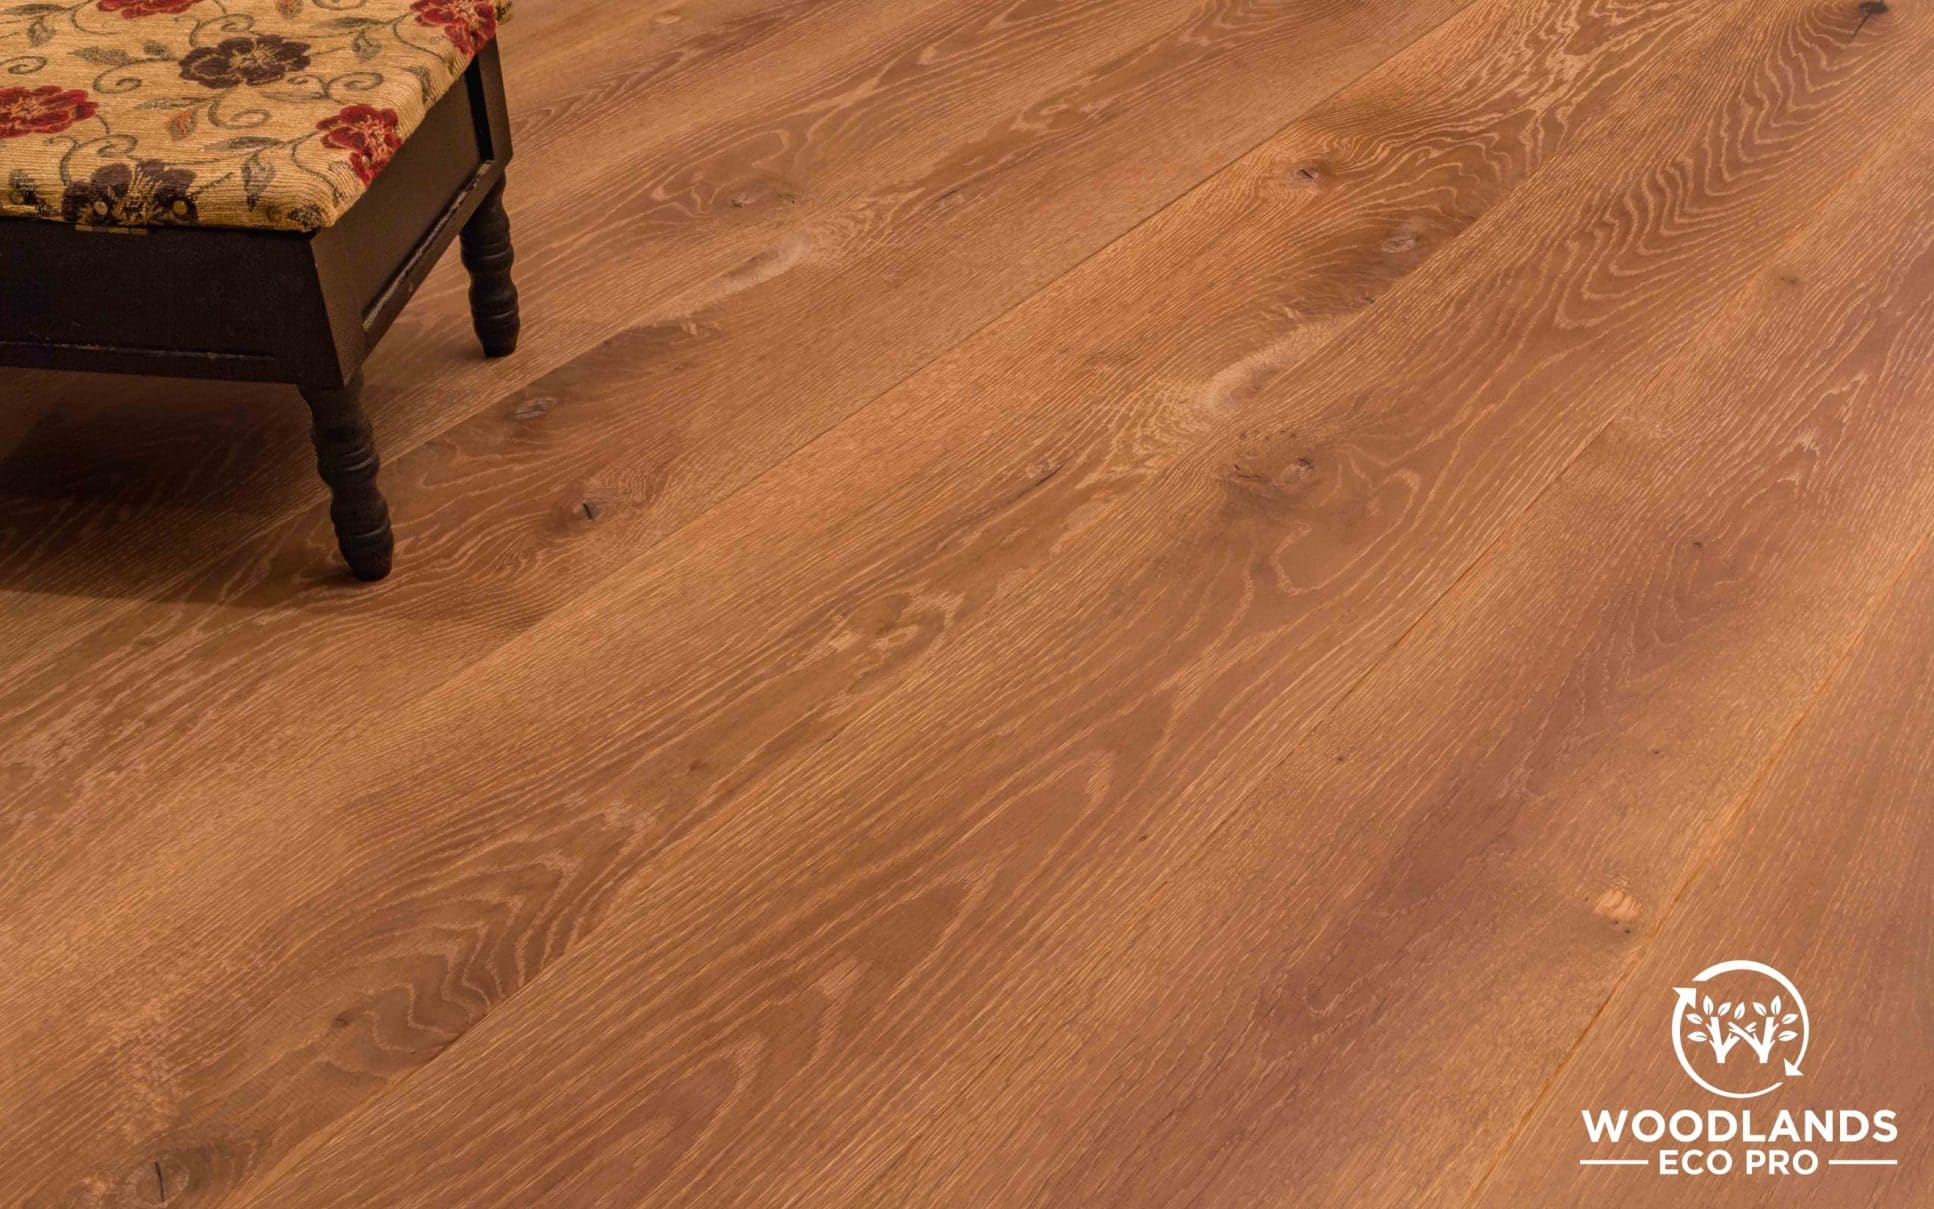 Woodlands Eco Pro Chateau Oak Oakwoods Outlet Oak Wood Flooring Specialists Oak Wood Floors Wood Floors Flooring